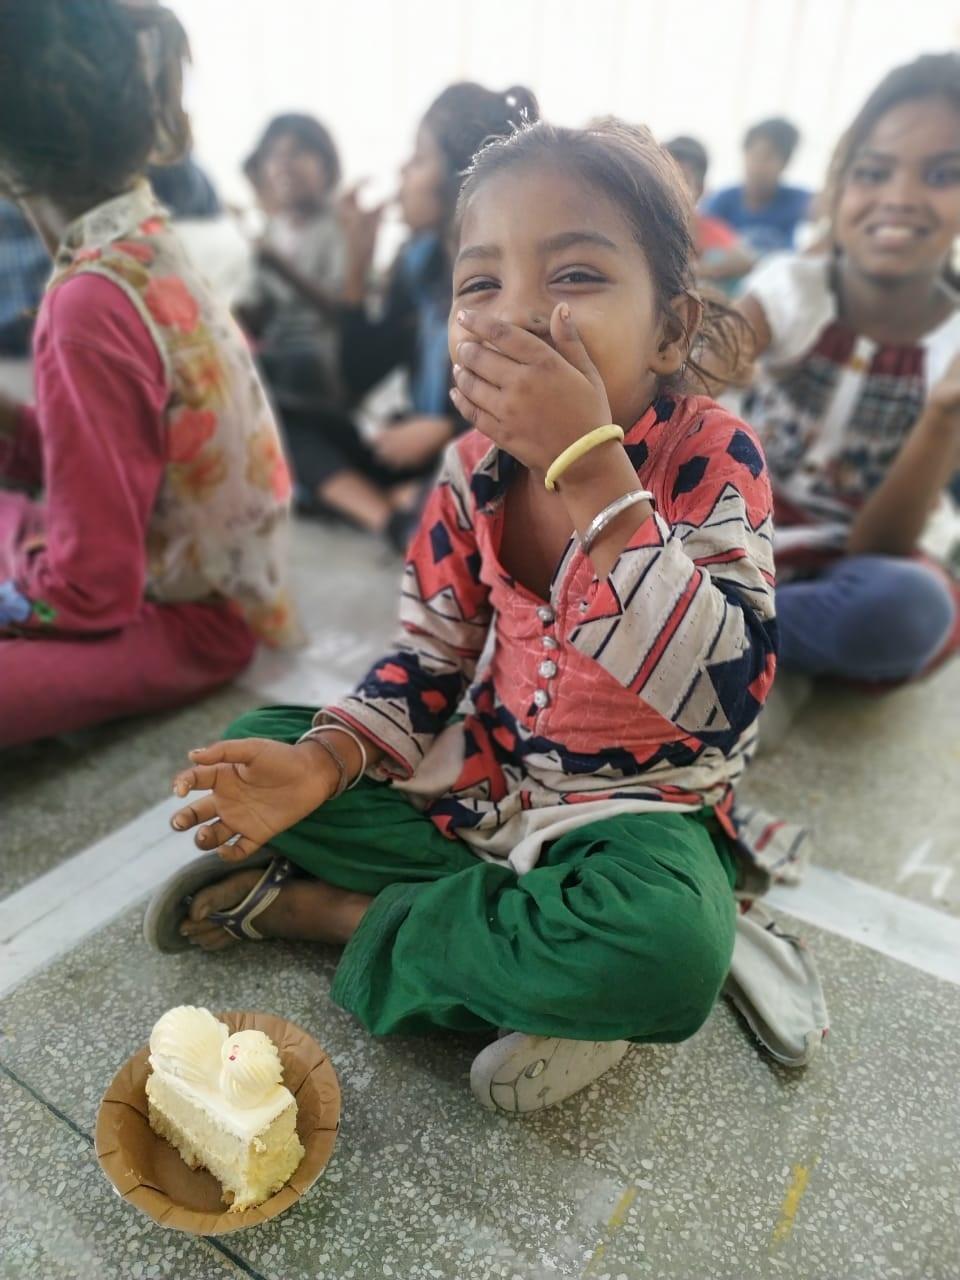 Food drive organised by Har Hath Kalam in Patiala, India